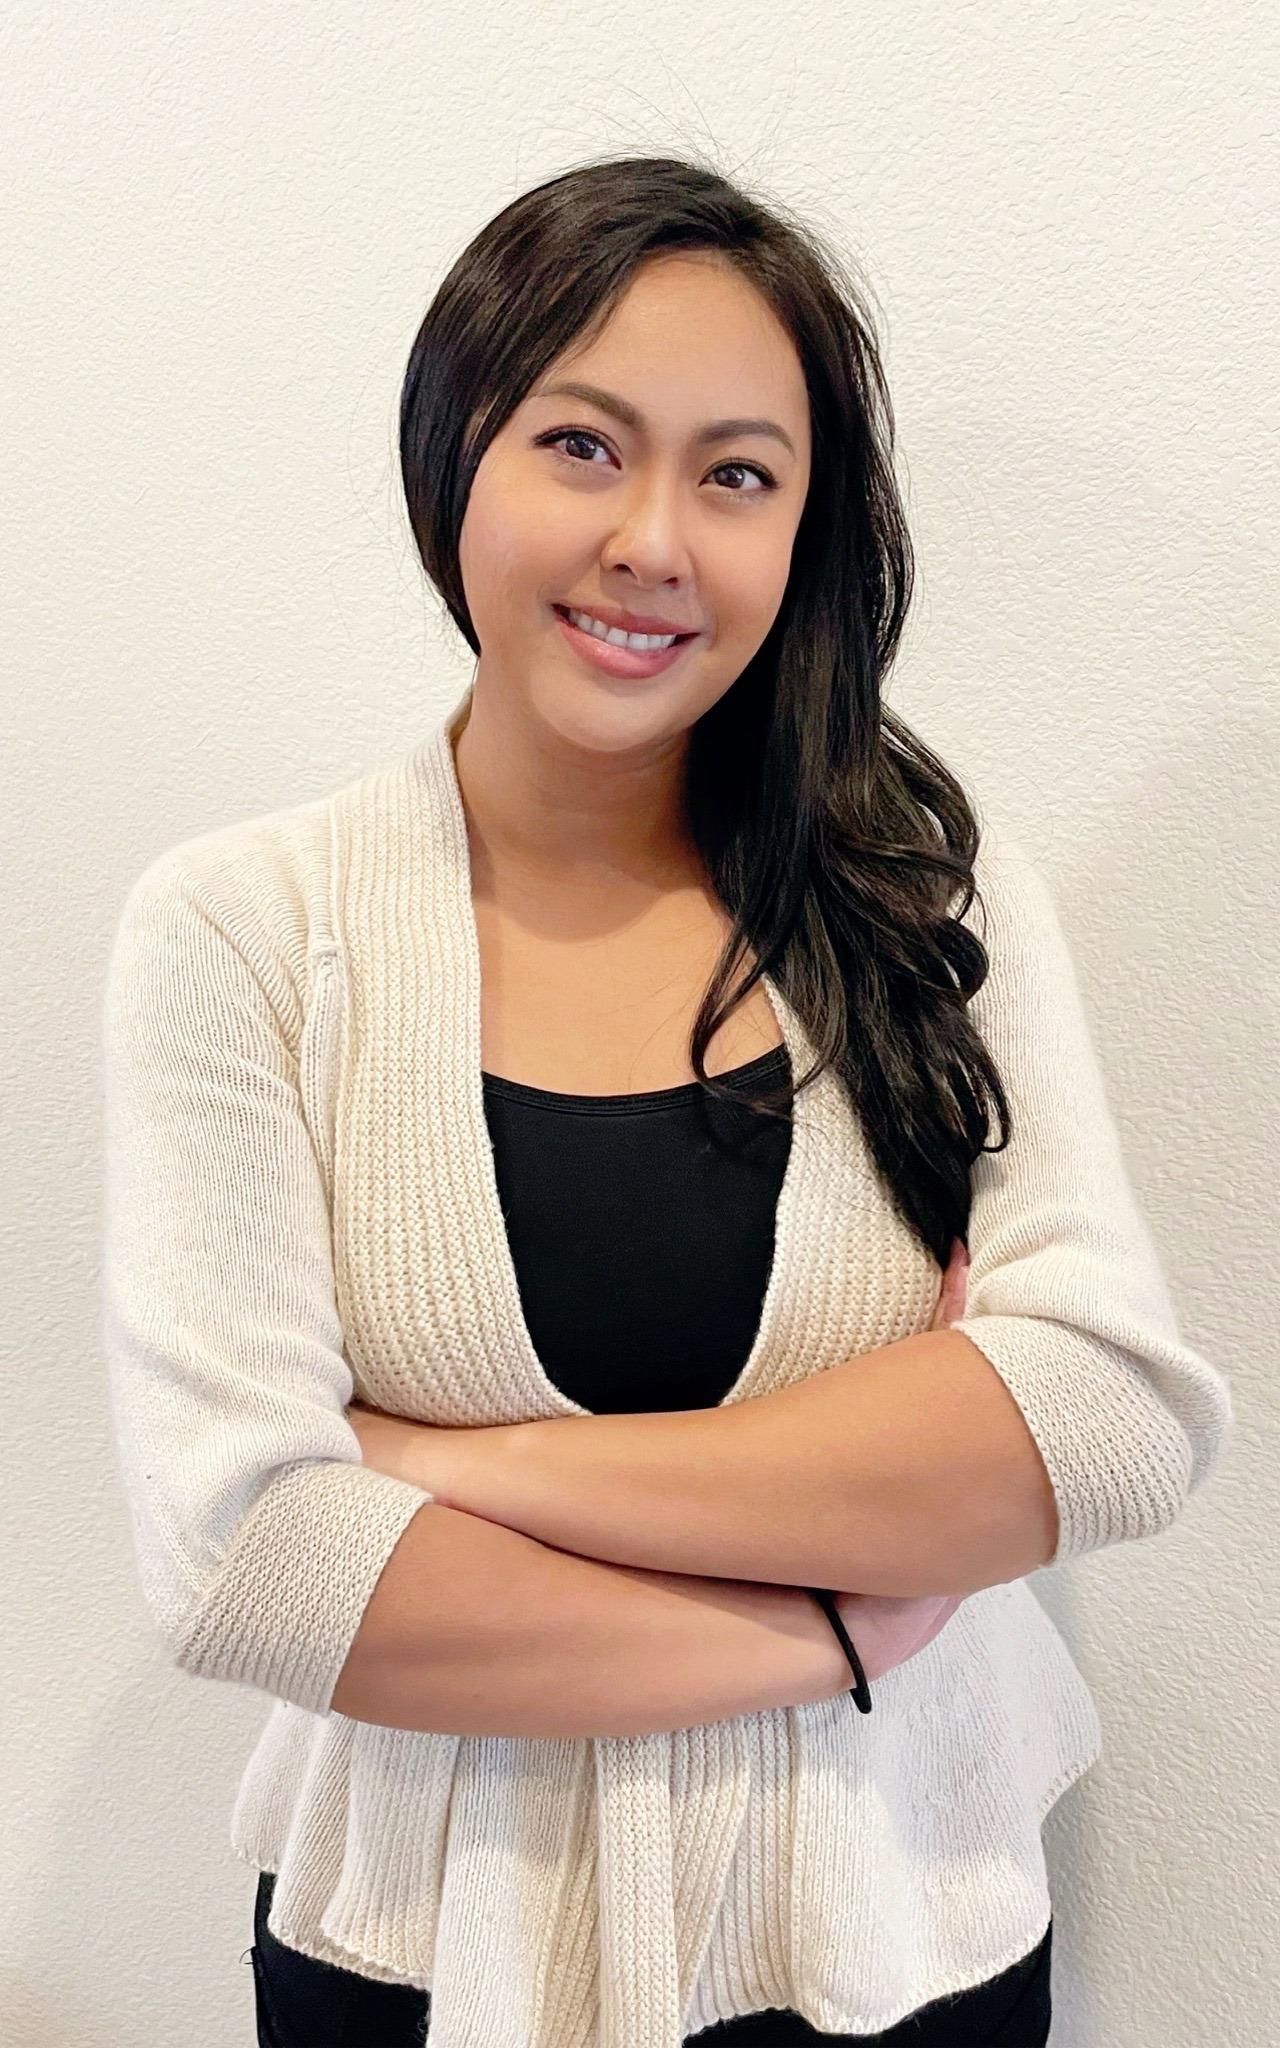 Thanhnhung undefined Nguyen